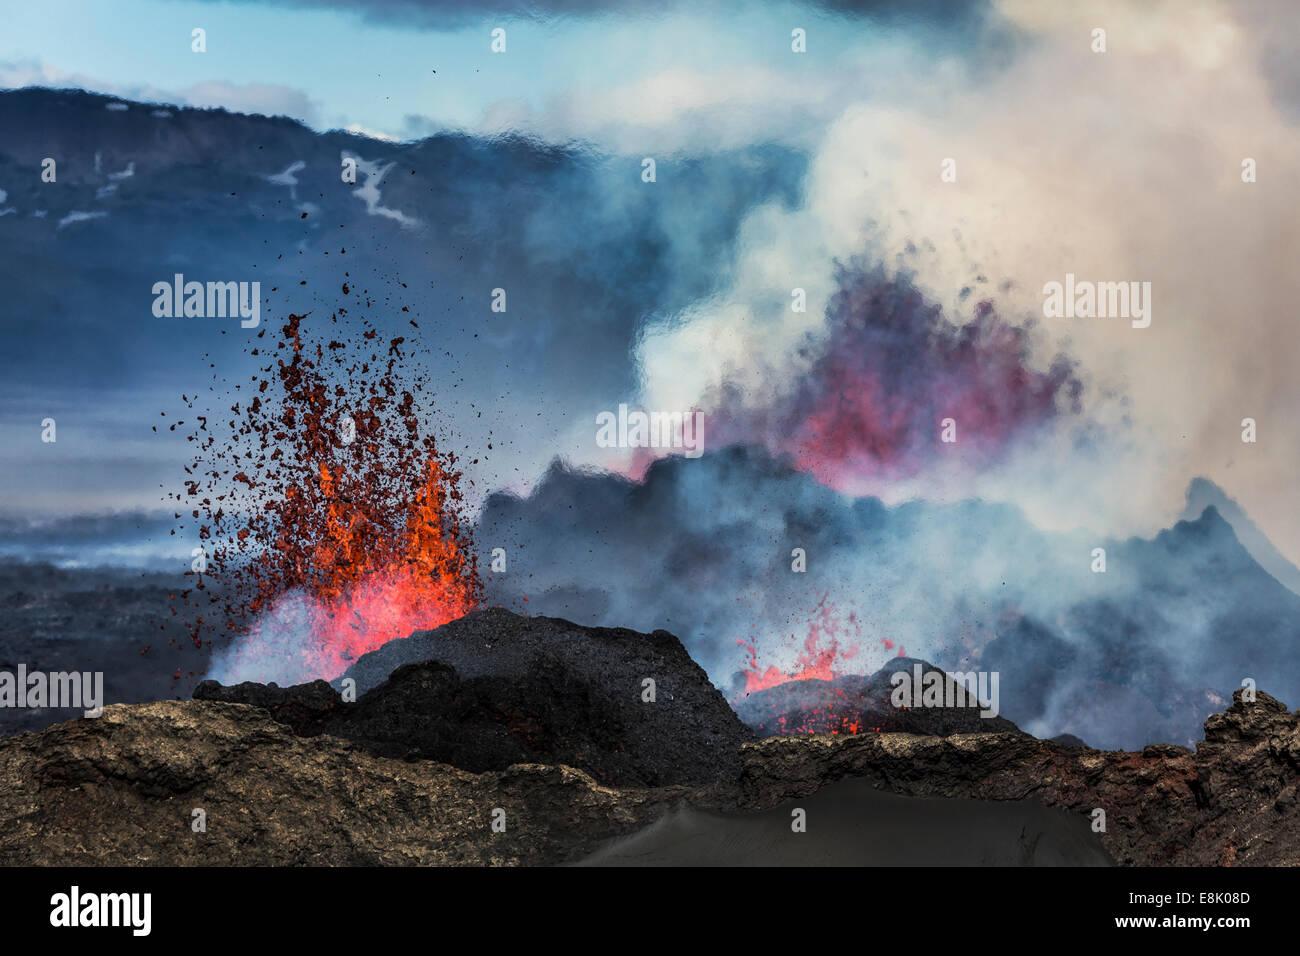 Volcano Eruption at the Holuhraun Fissure near Bardarbunga Volcano, Iceland. Stock Photo